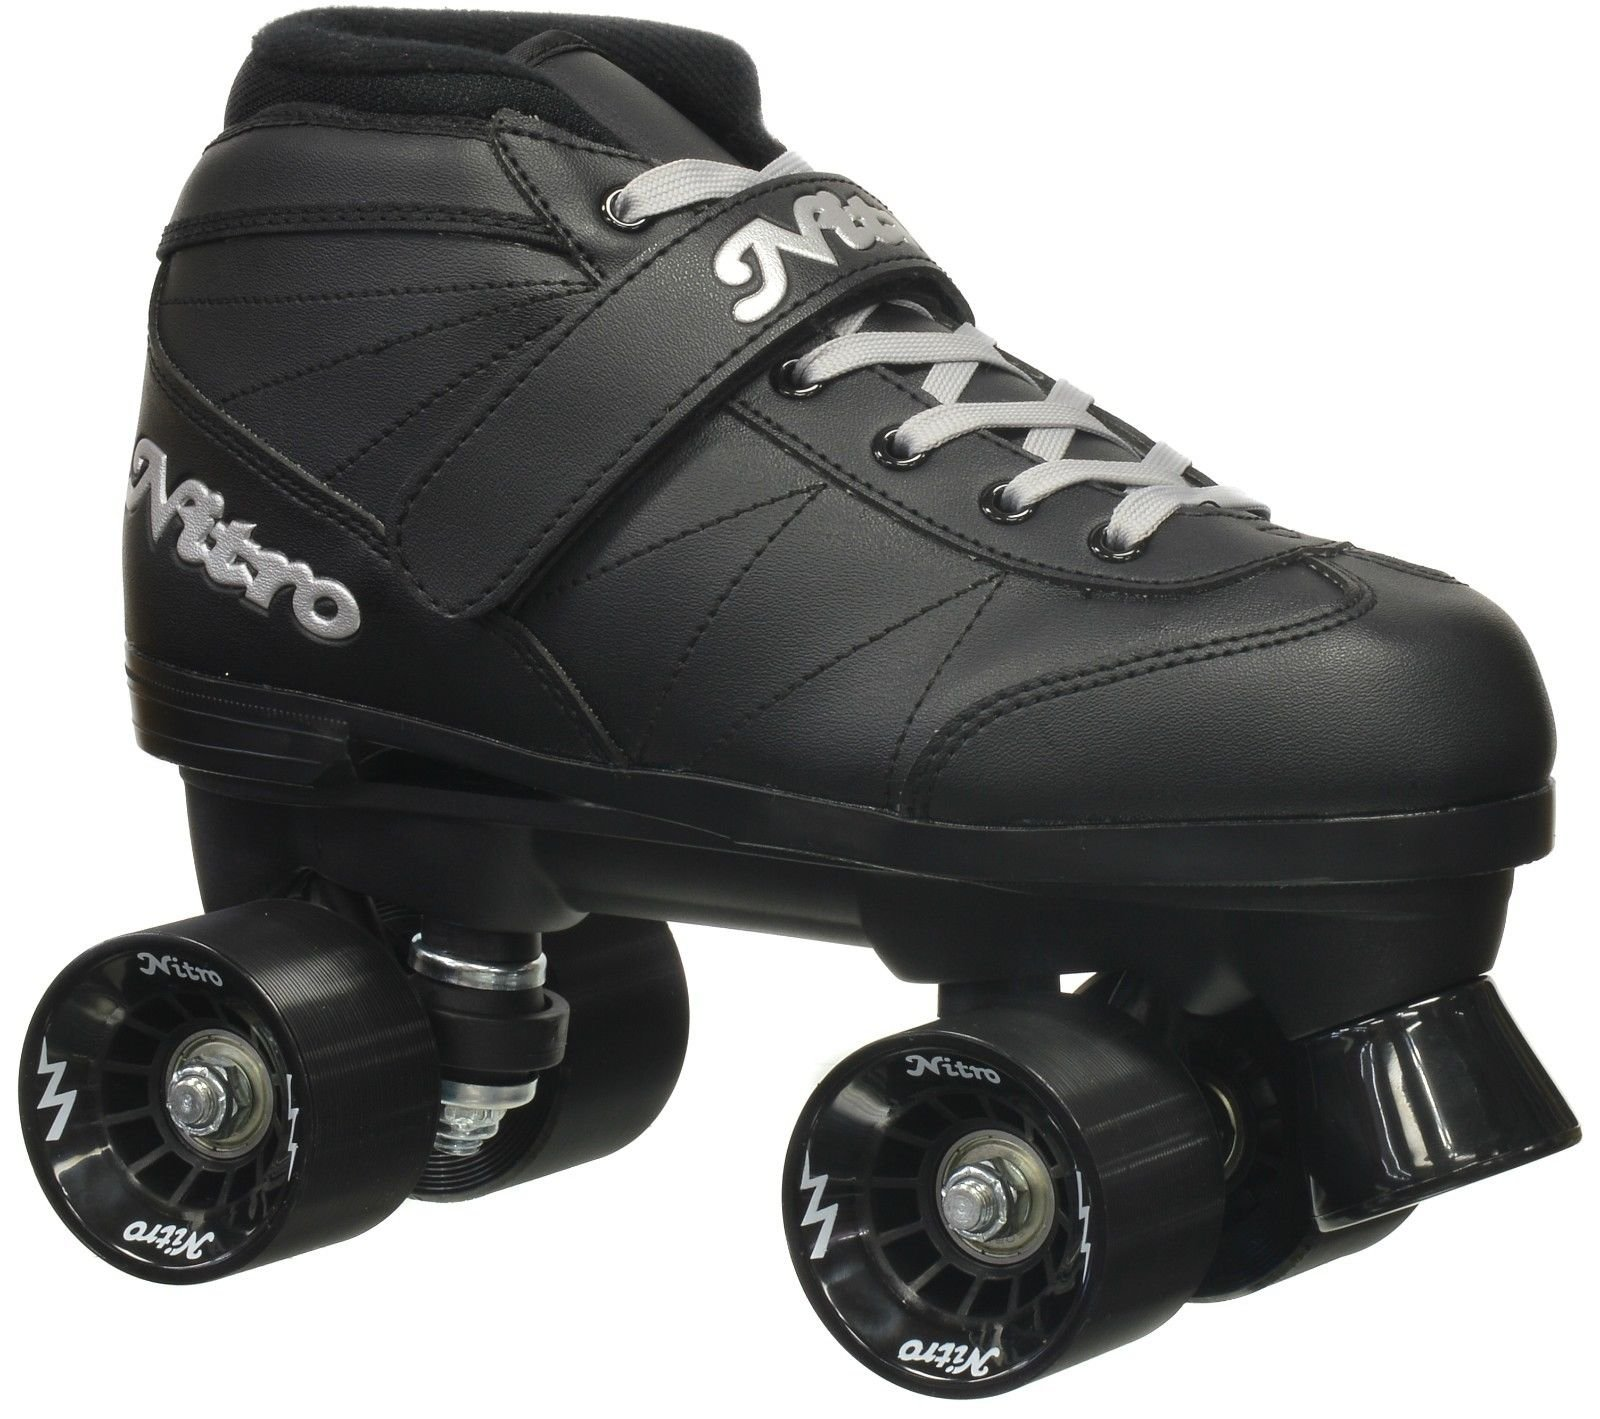 Epic Skates Epic Super Nitro Black Quad Speed Roller Skates Kids 9